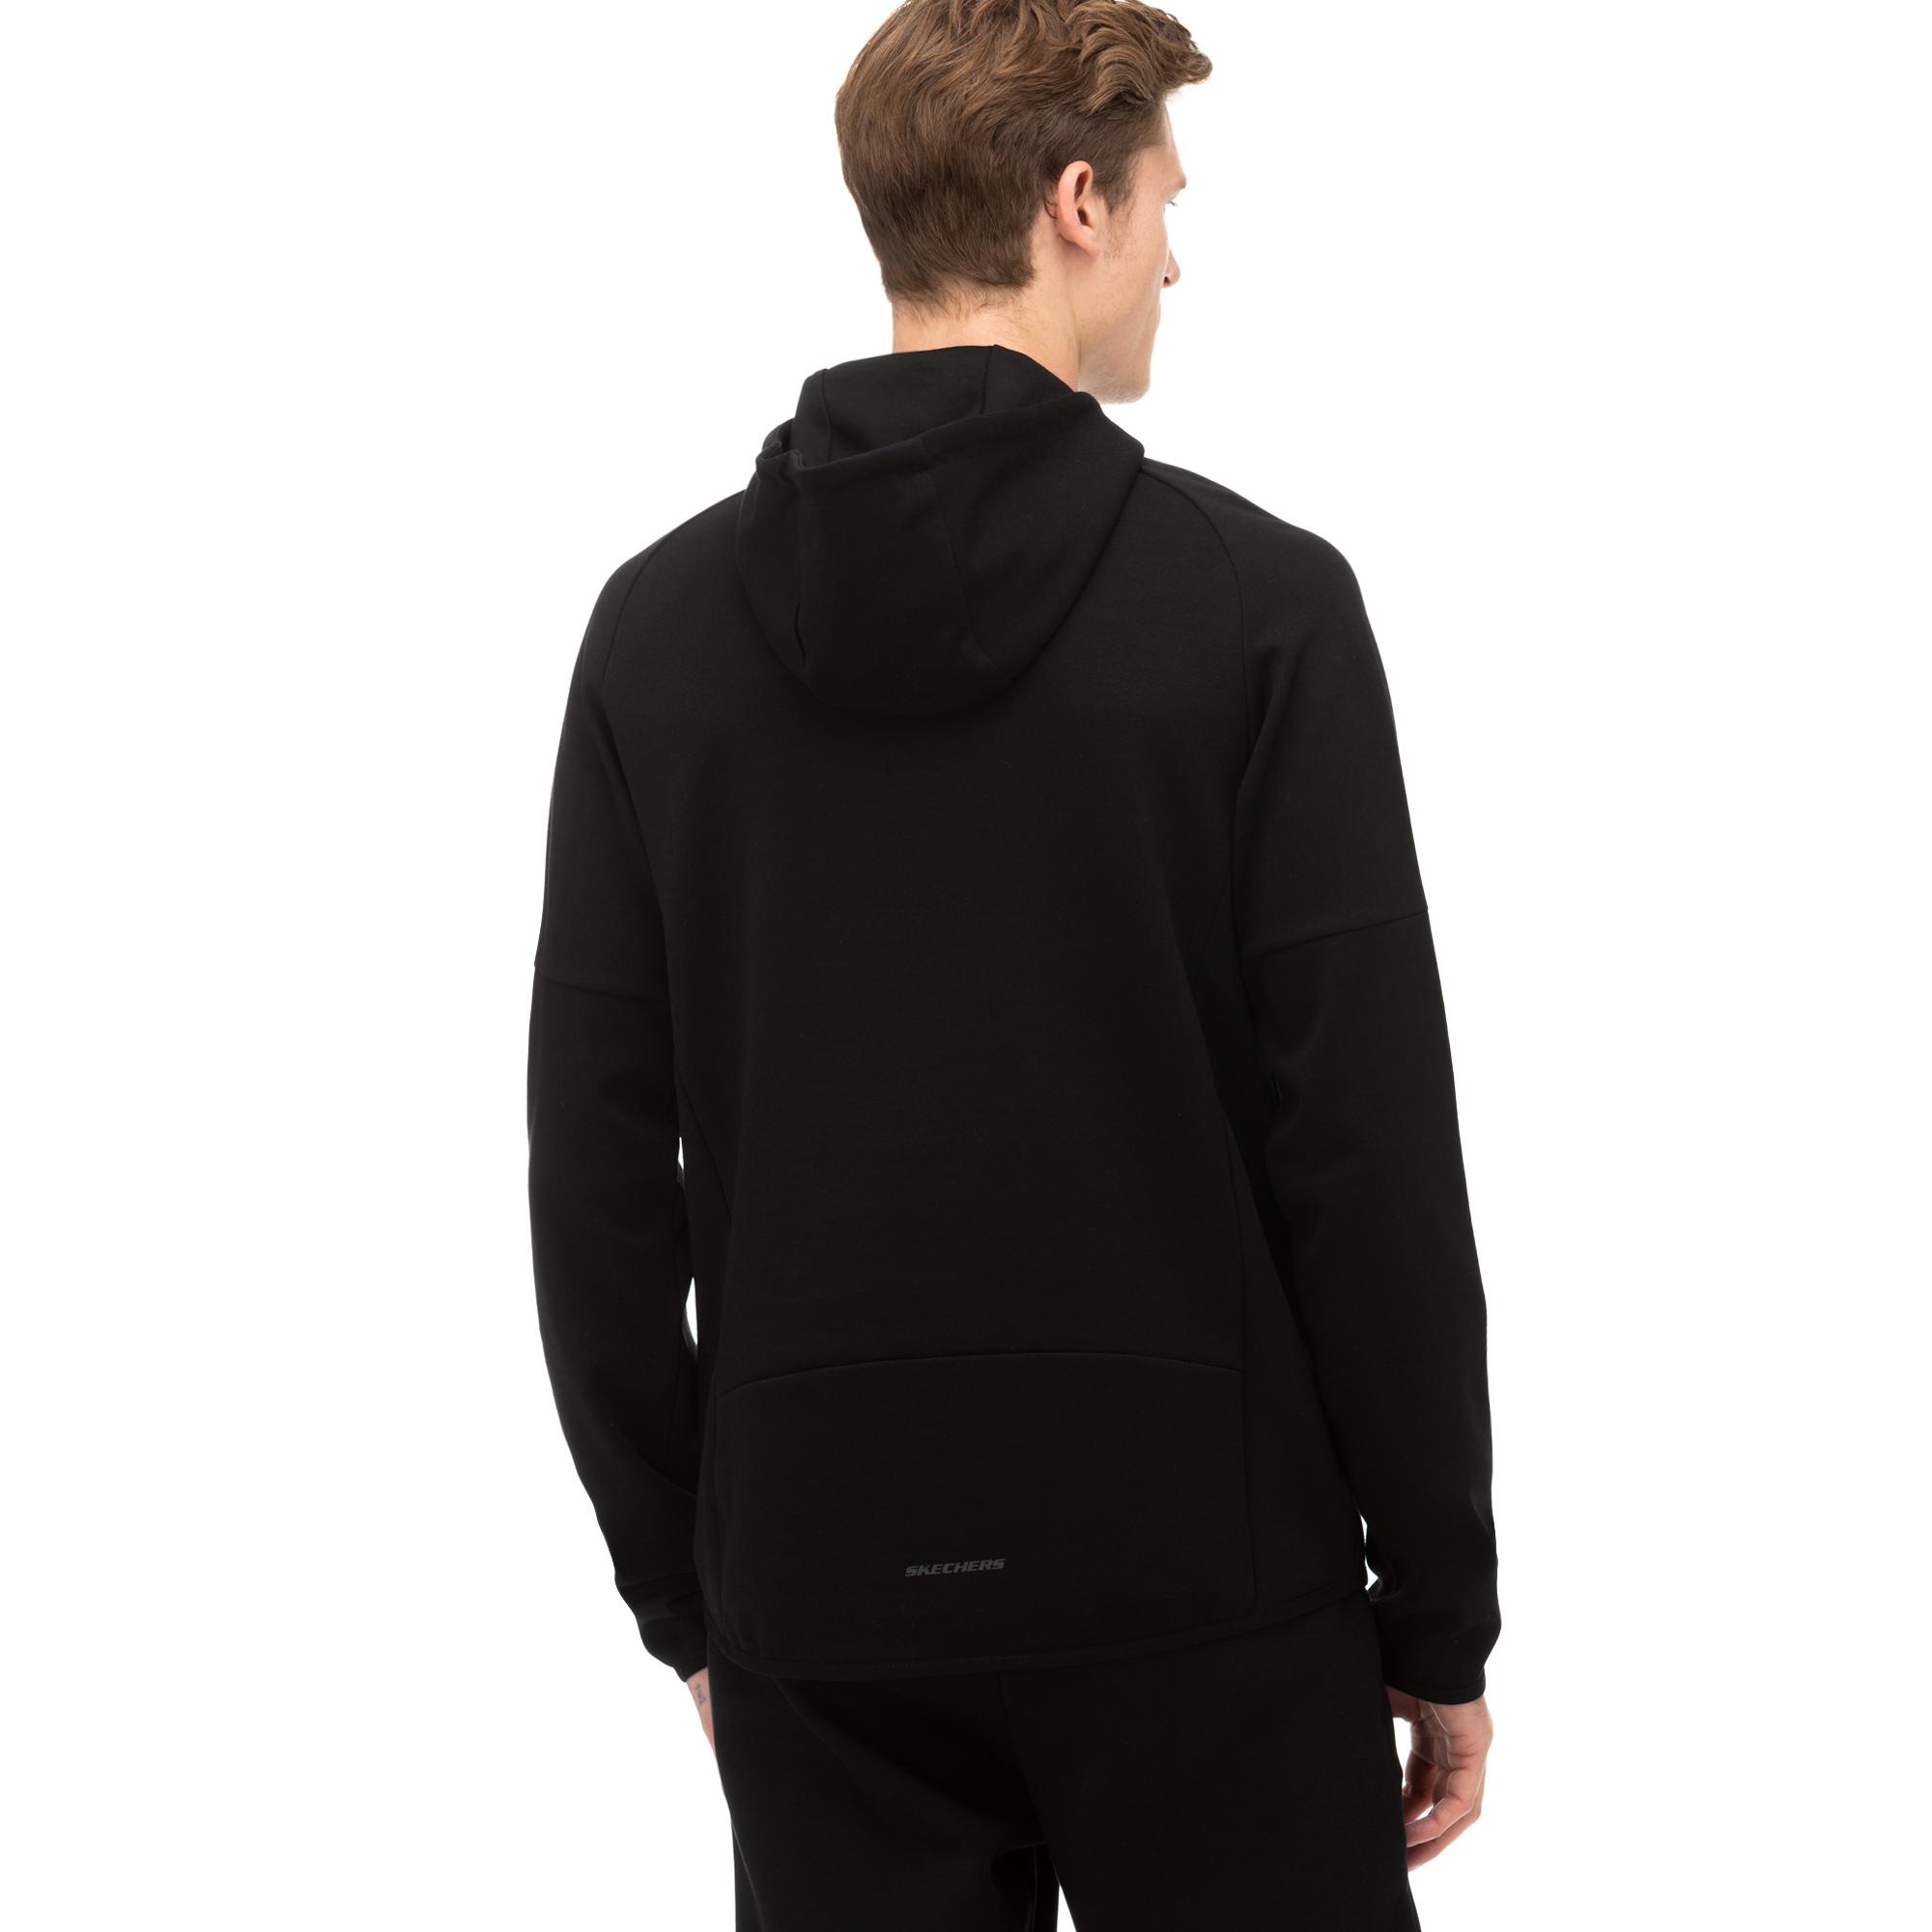 Skechers 2X I-Lock FLX Siyah Erkek Sweatshirt